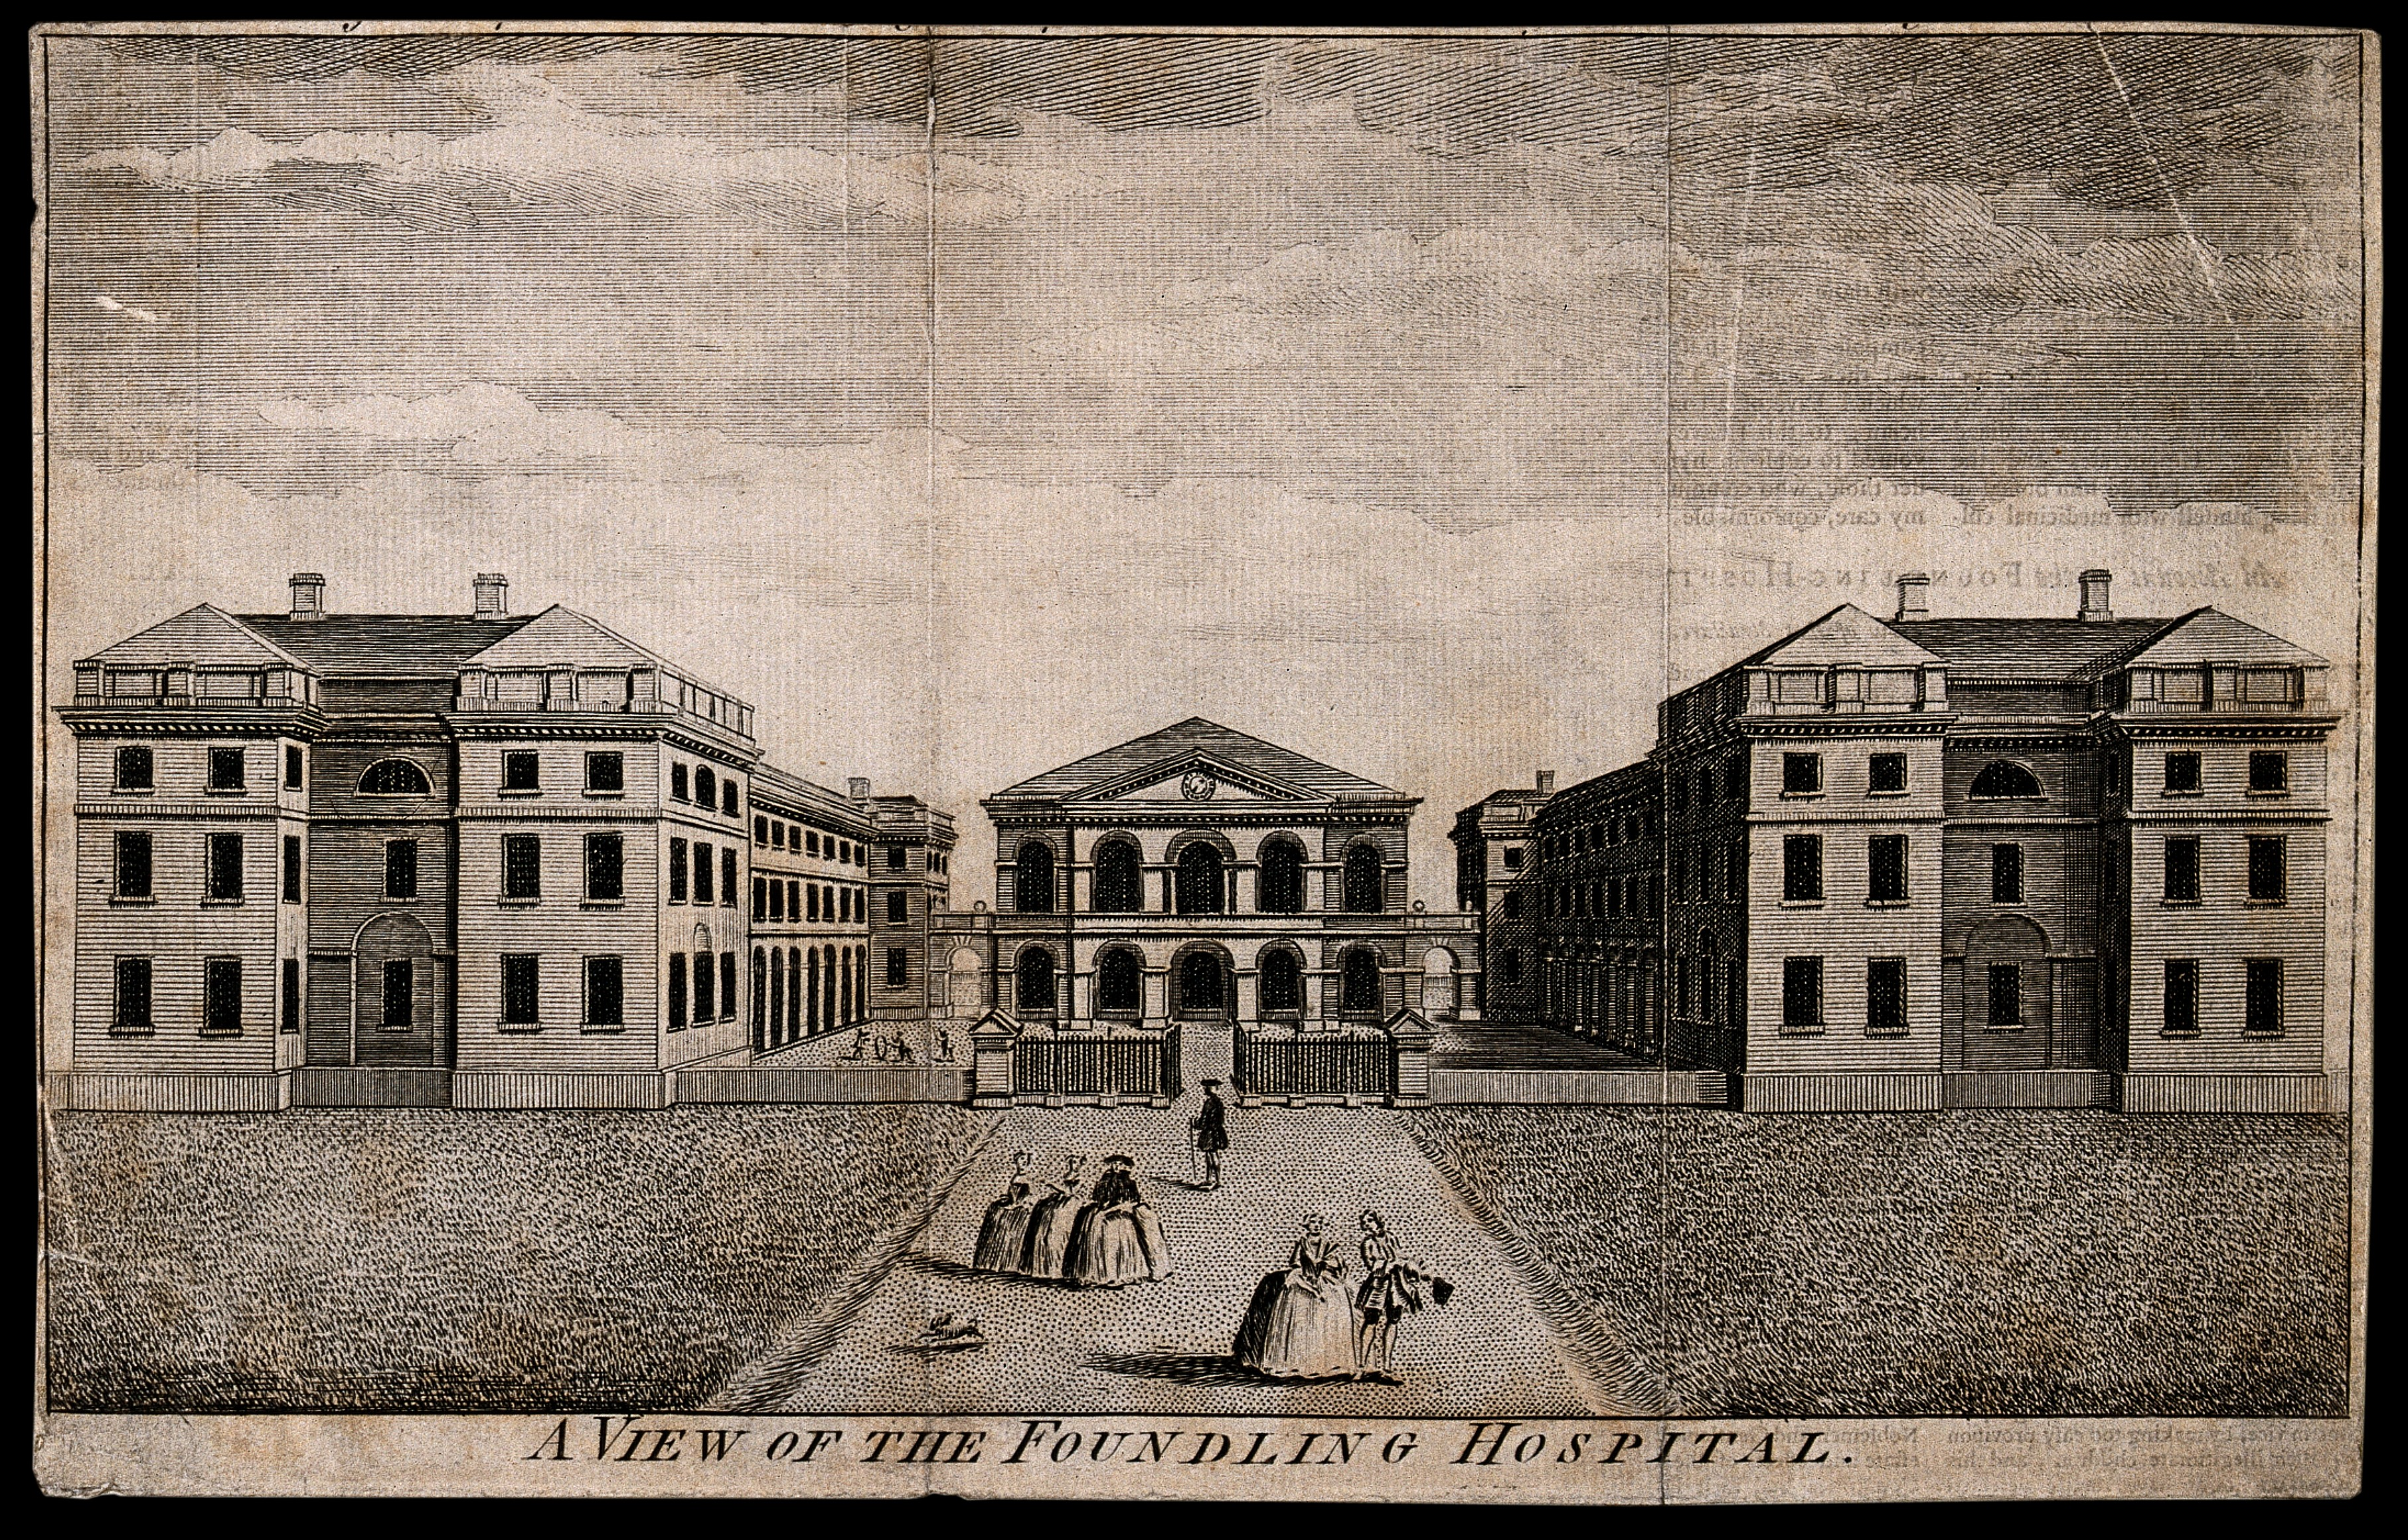 London foundling hospital have